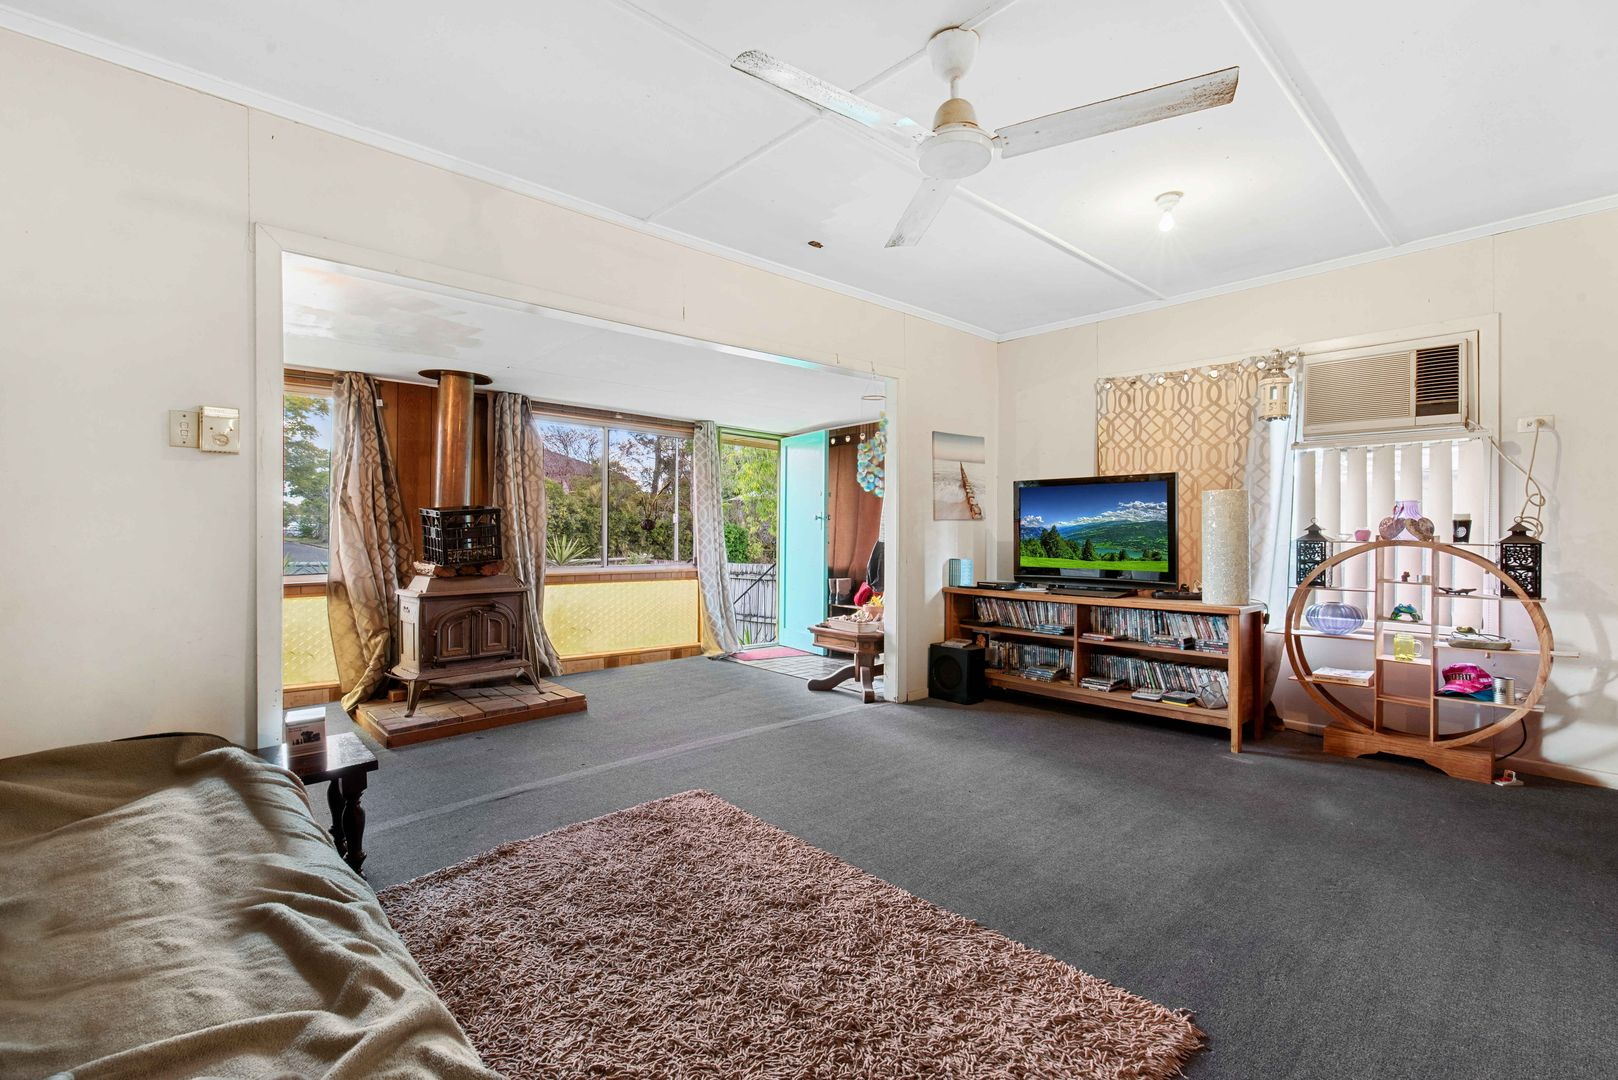 87 SHERWOOD Road, Rocklea QLD 4106, Image 2